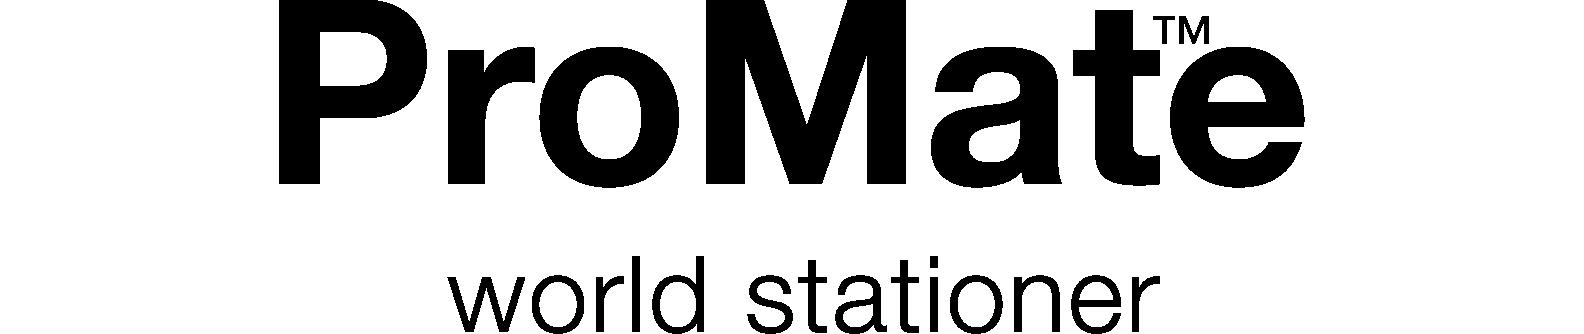 ProMate - World Stationer